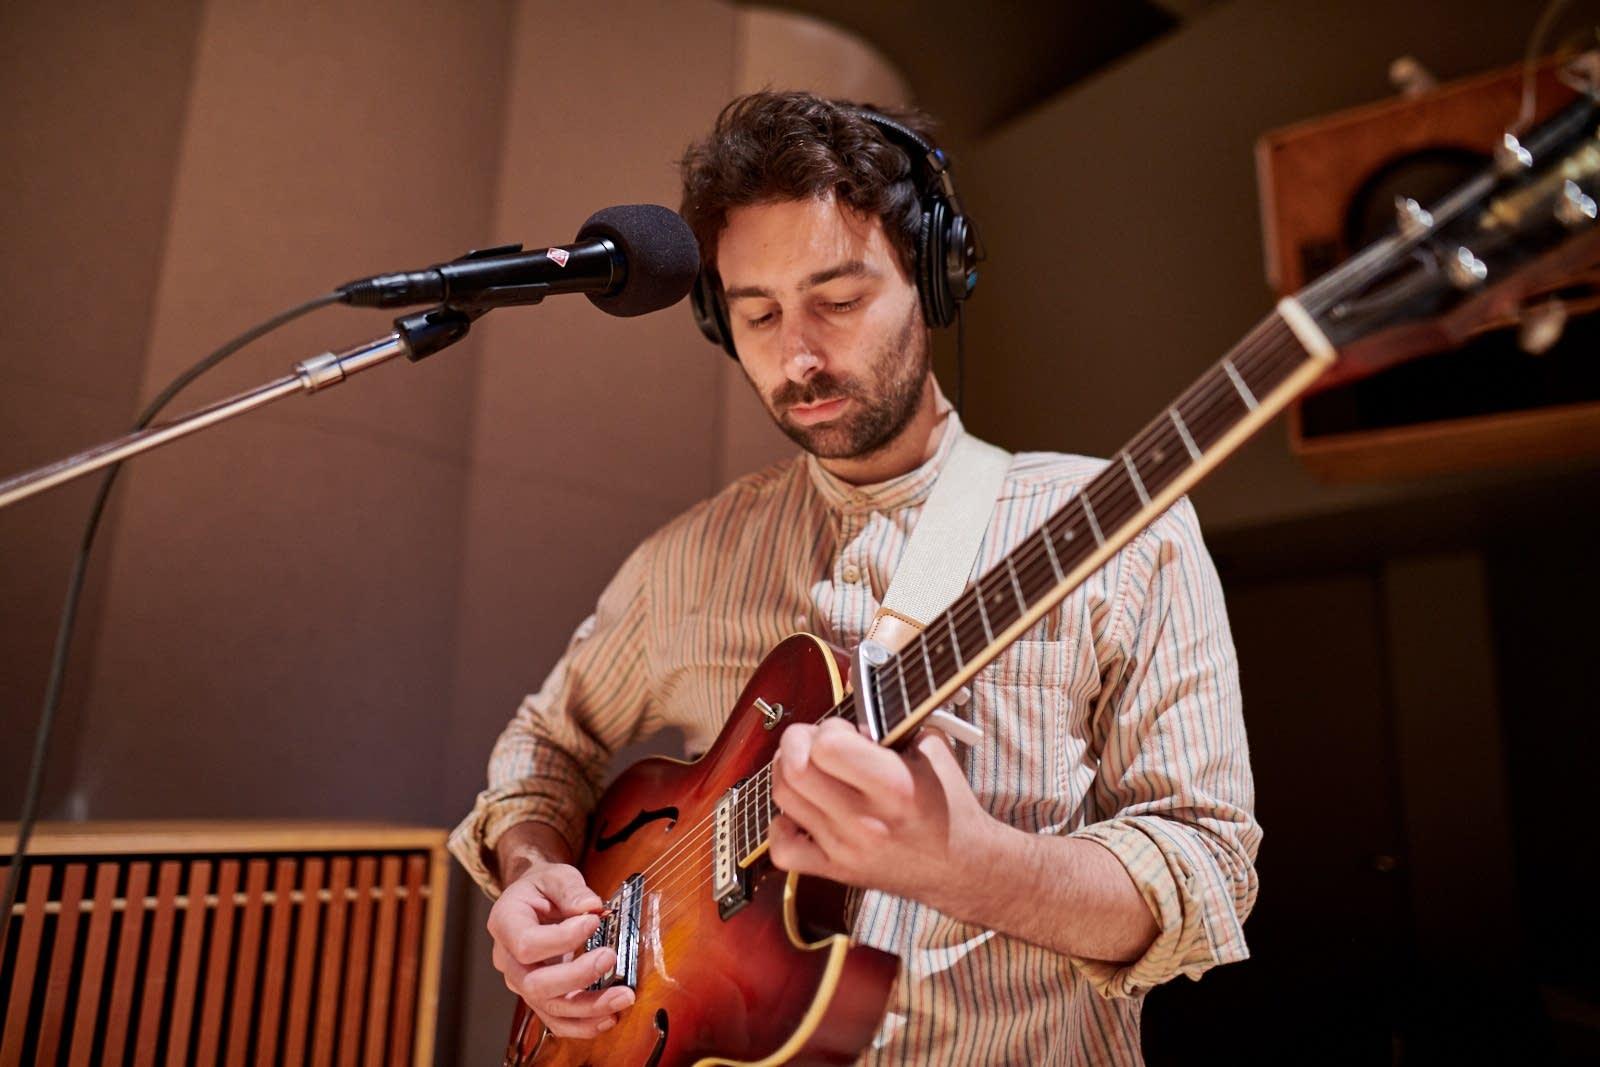 Okkervil River perform in The Current studio